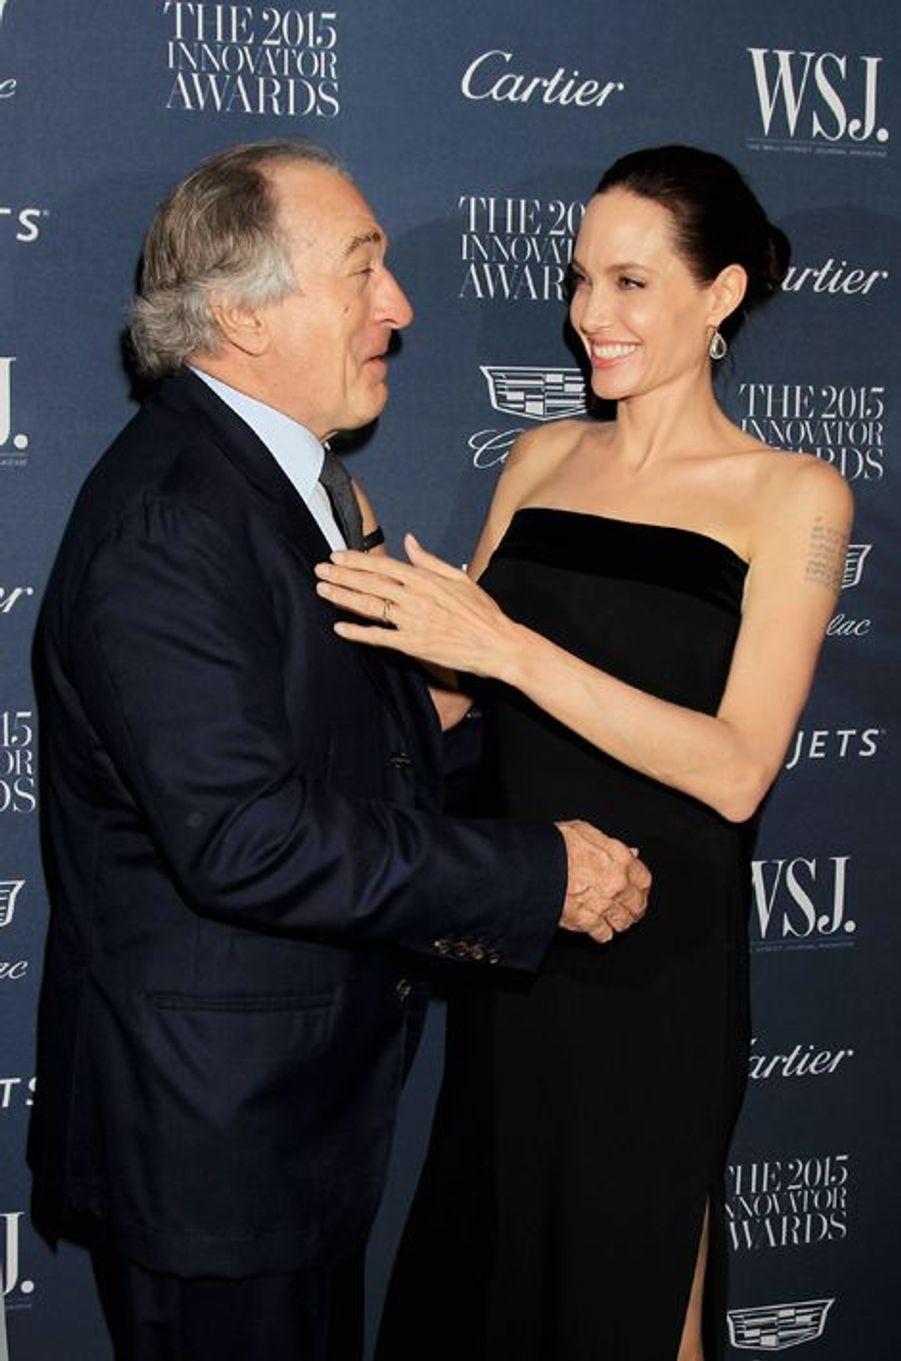 Robert De Niro et Angelina Jolie à New York le 4 novembre 2015